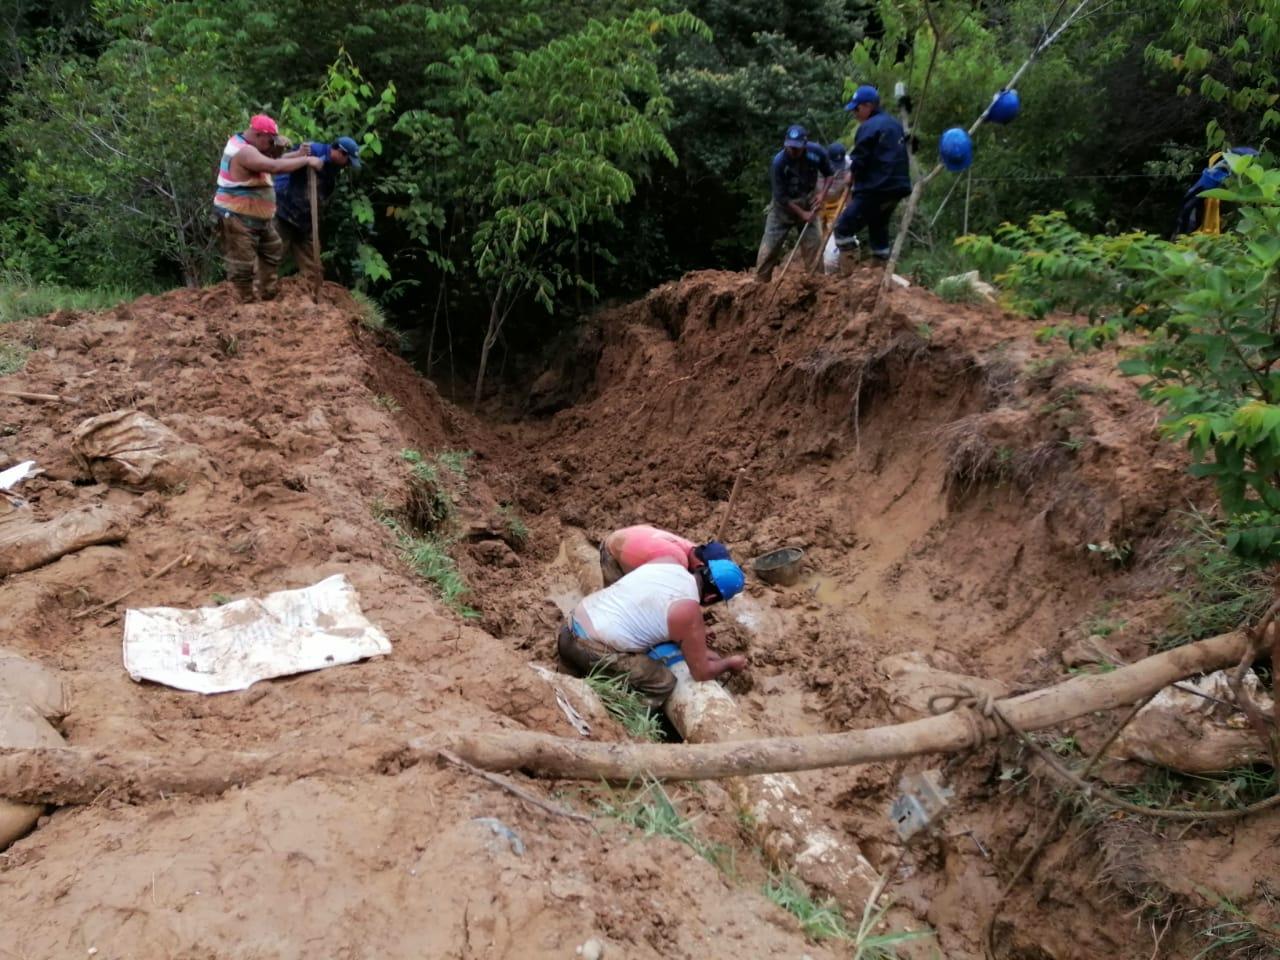 Chaparral en Alerta Naranja por intensas lluvias 4